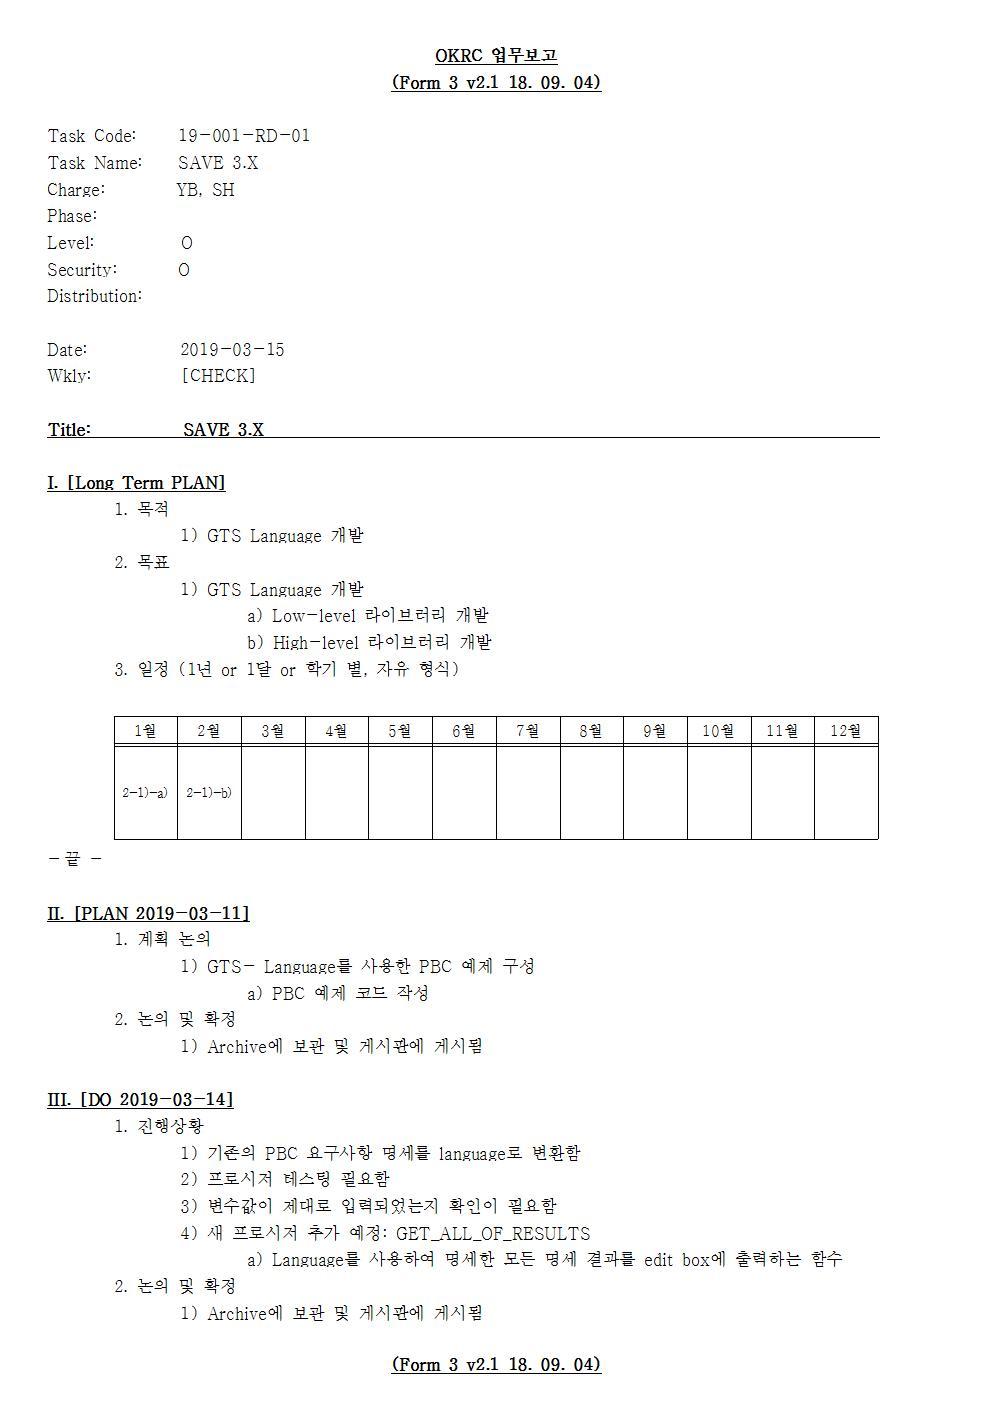 D-[19-001-RD-01]-[SAVE 3.X]-[2019-03-15][SH]001.jpg